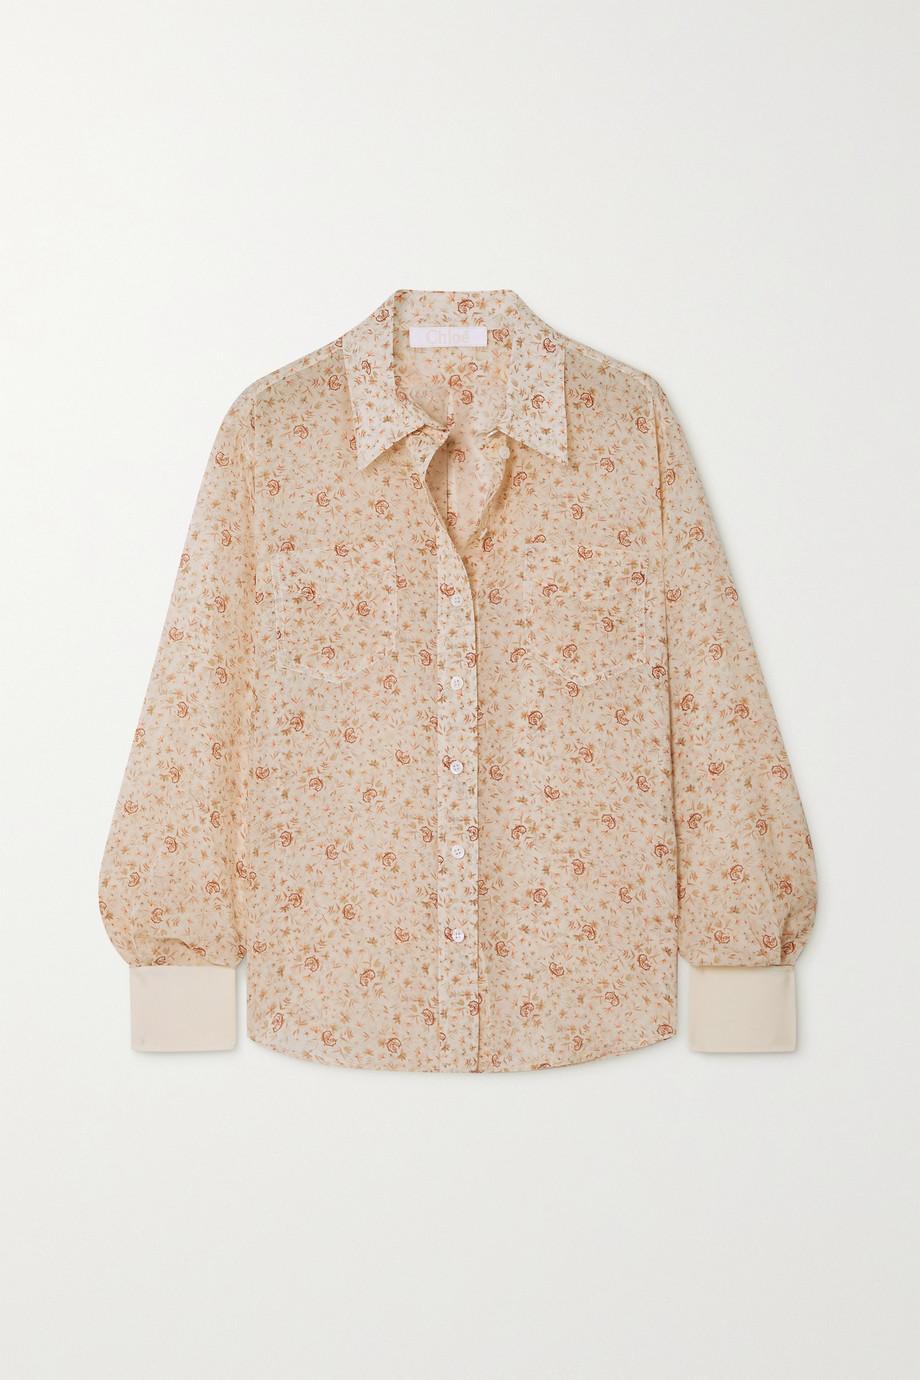 Chloé Floral-print silk shirt